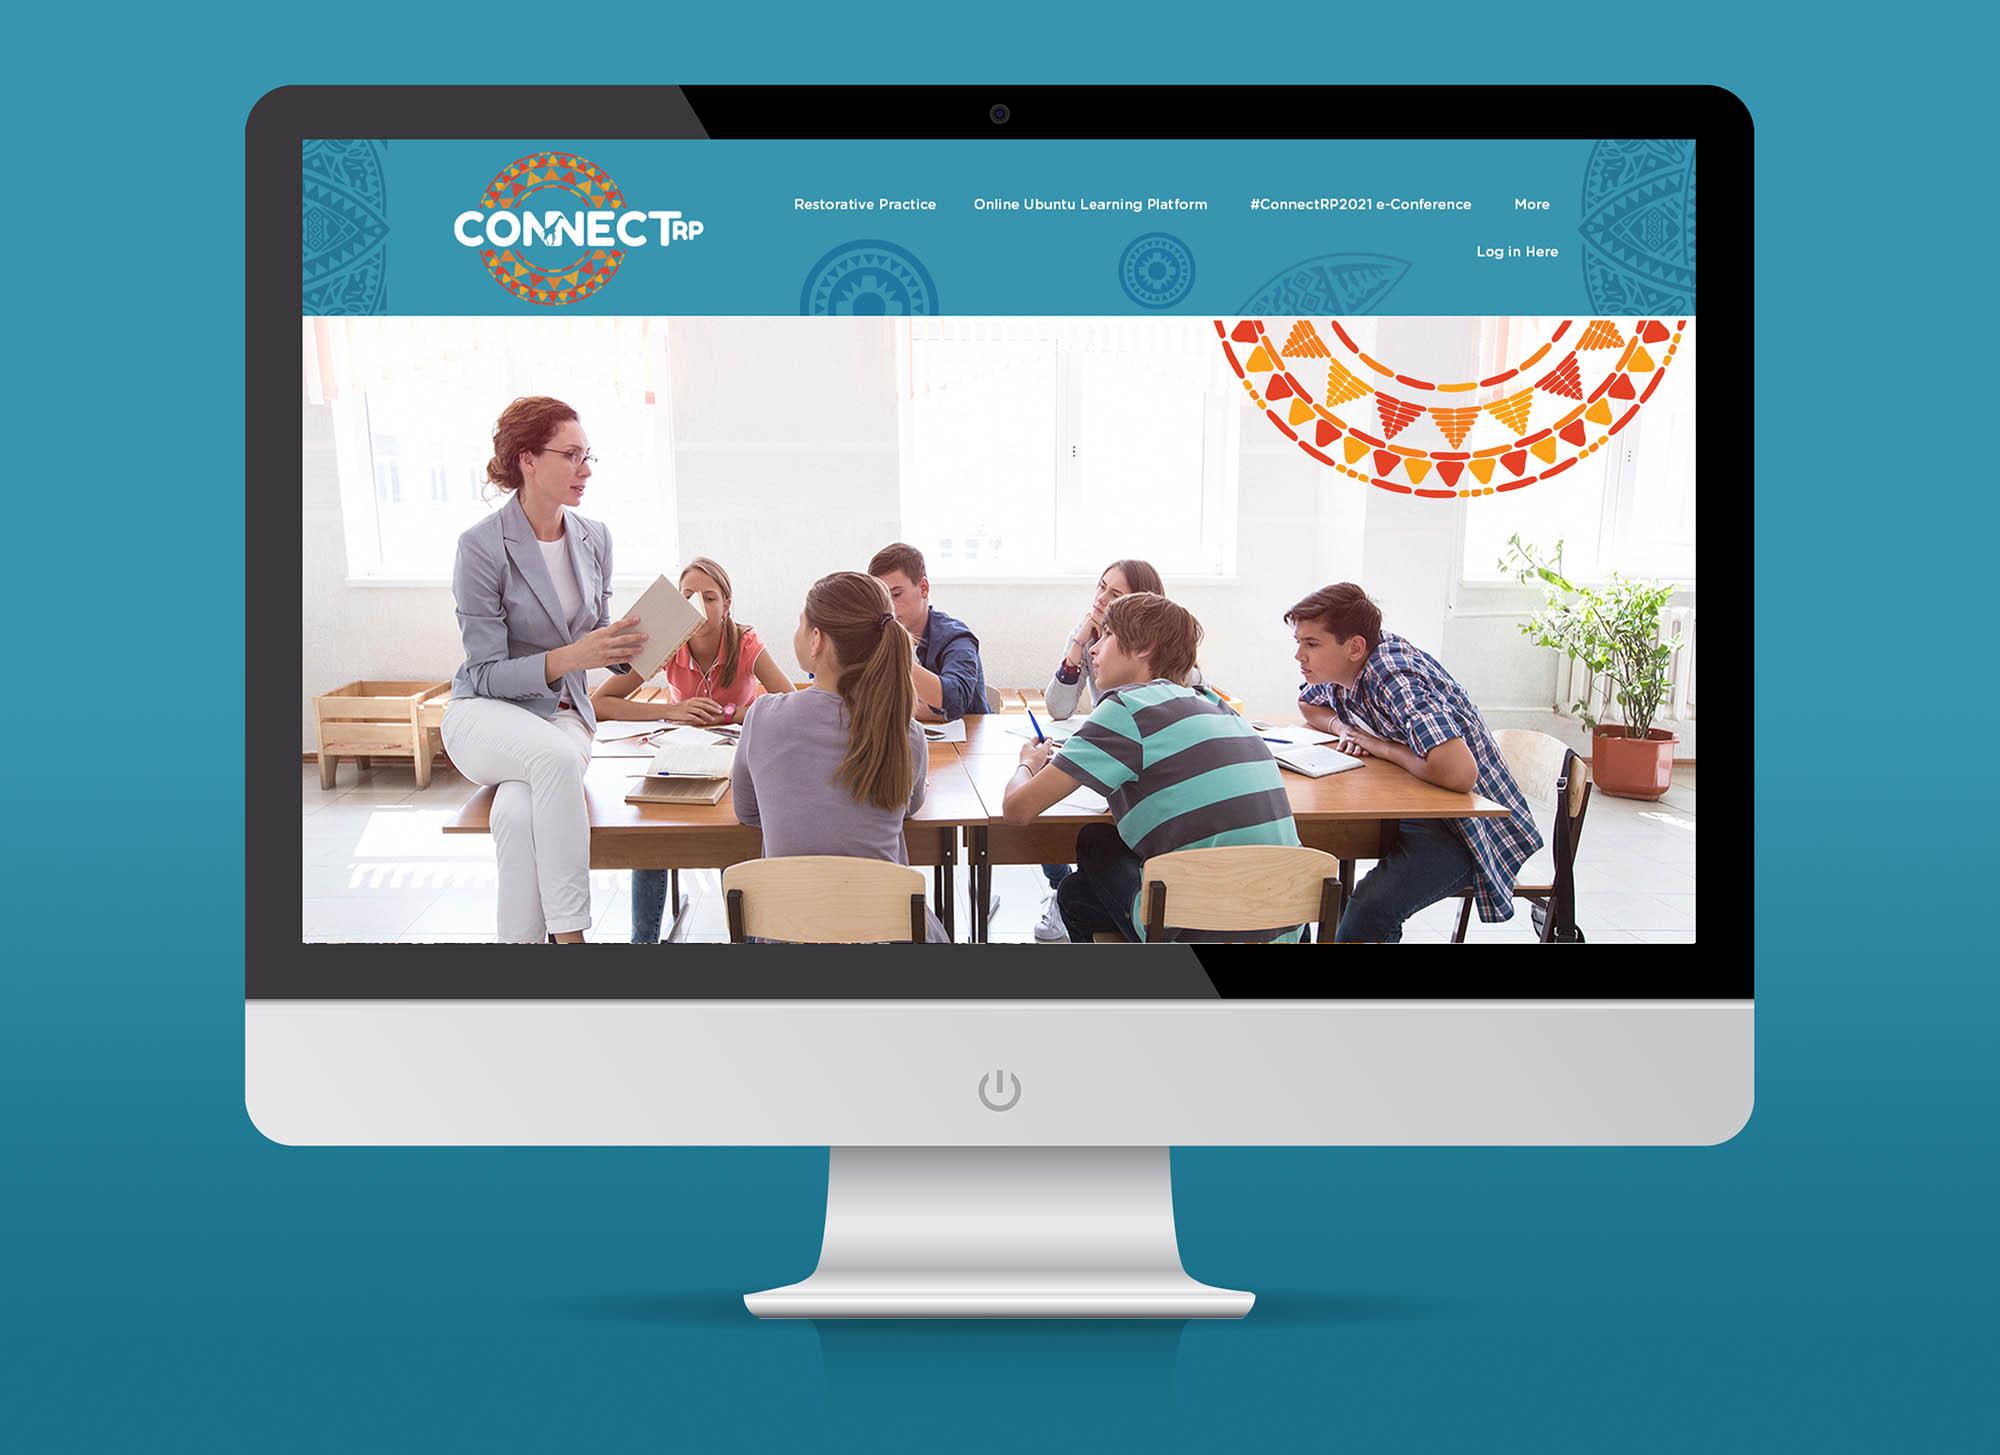 Connect Rp Website